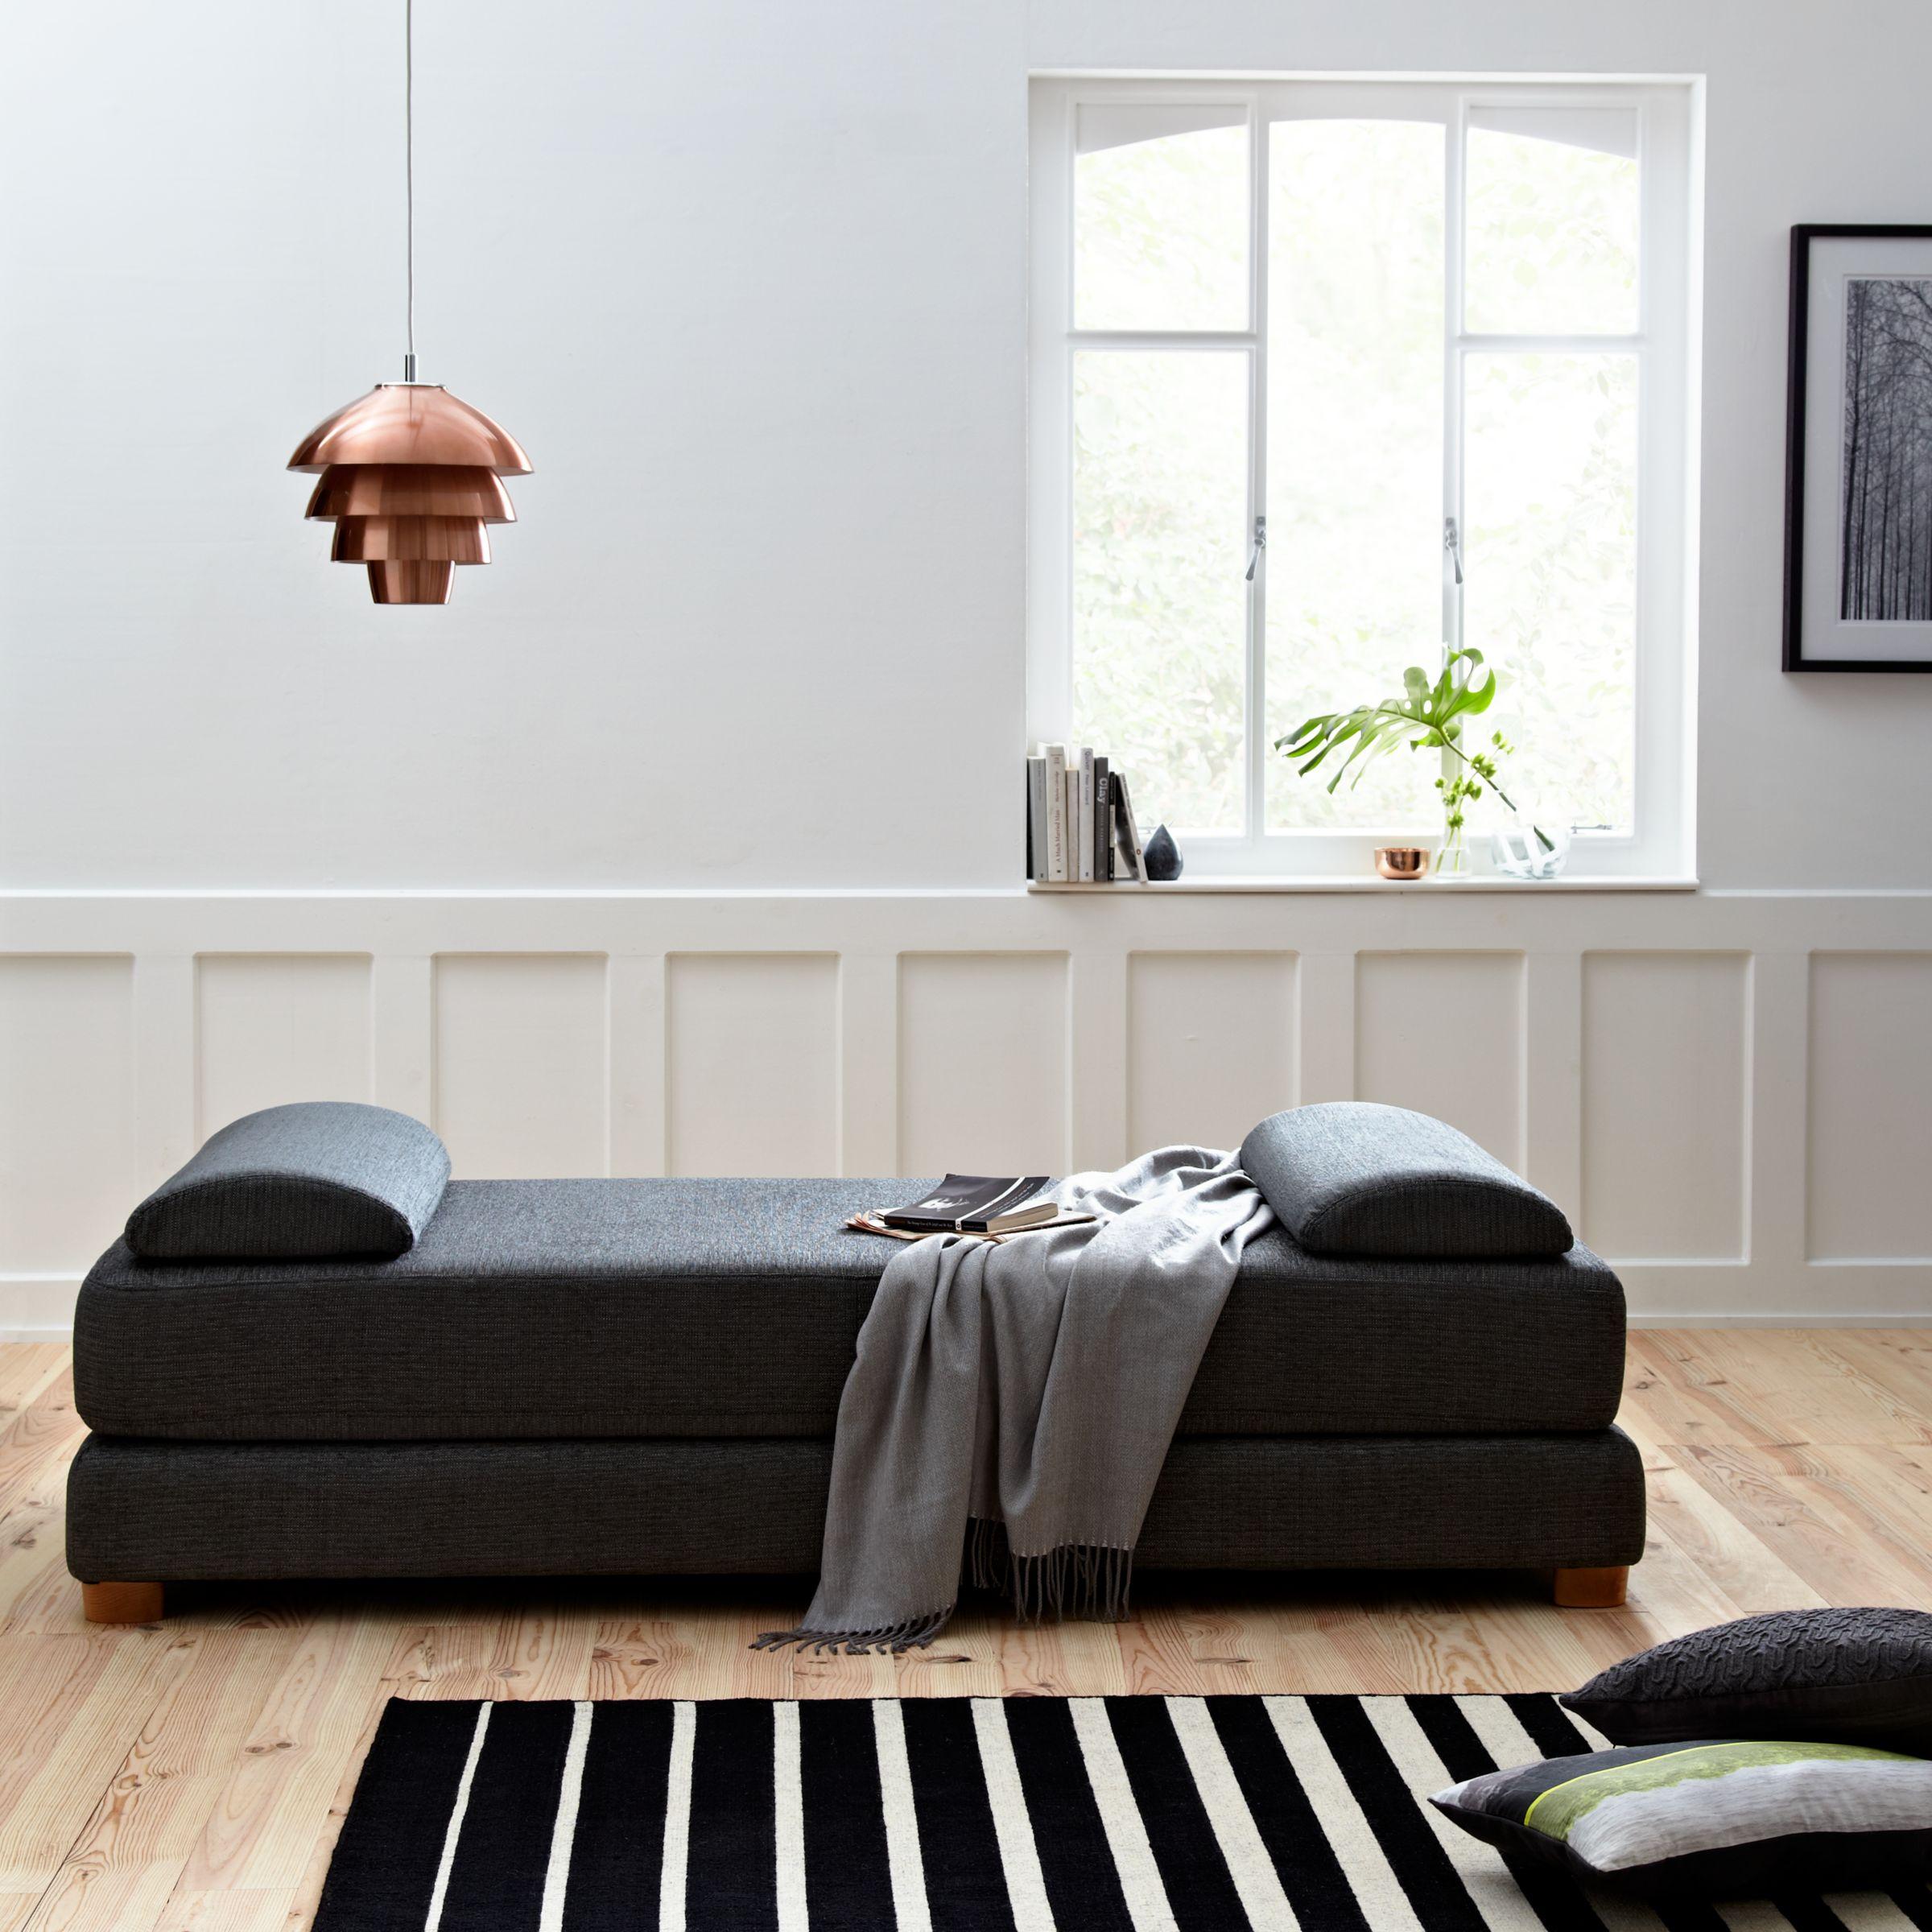 - John Lewis & Partners Sonoma Sofa Bed At John Lewis & Partners